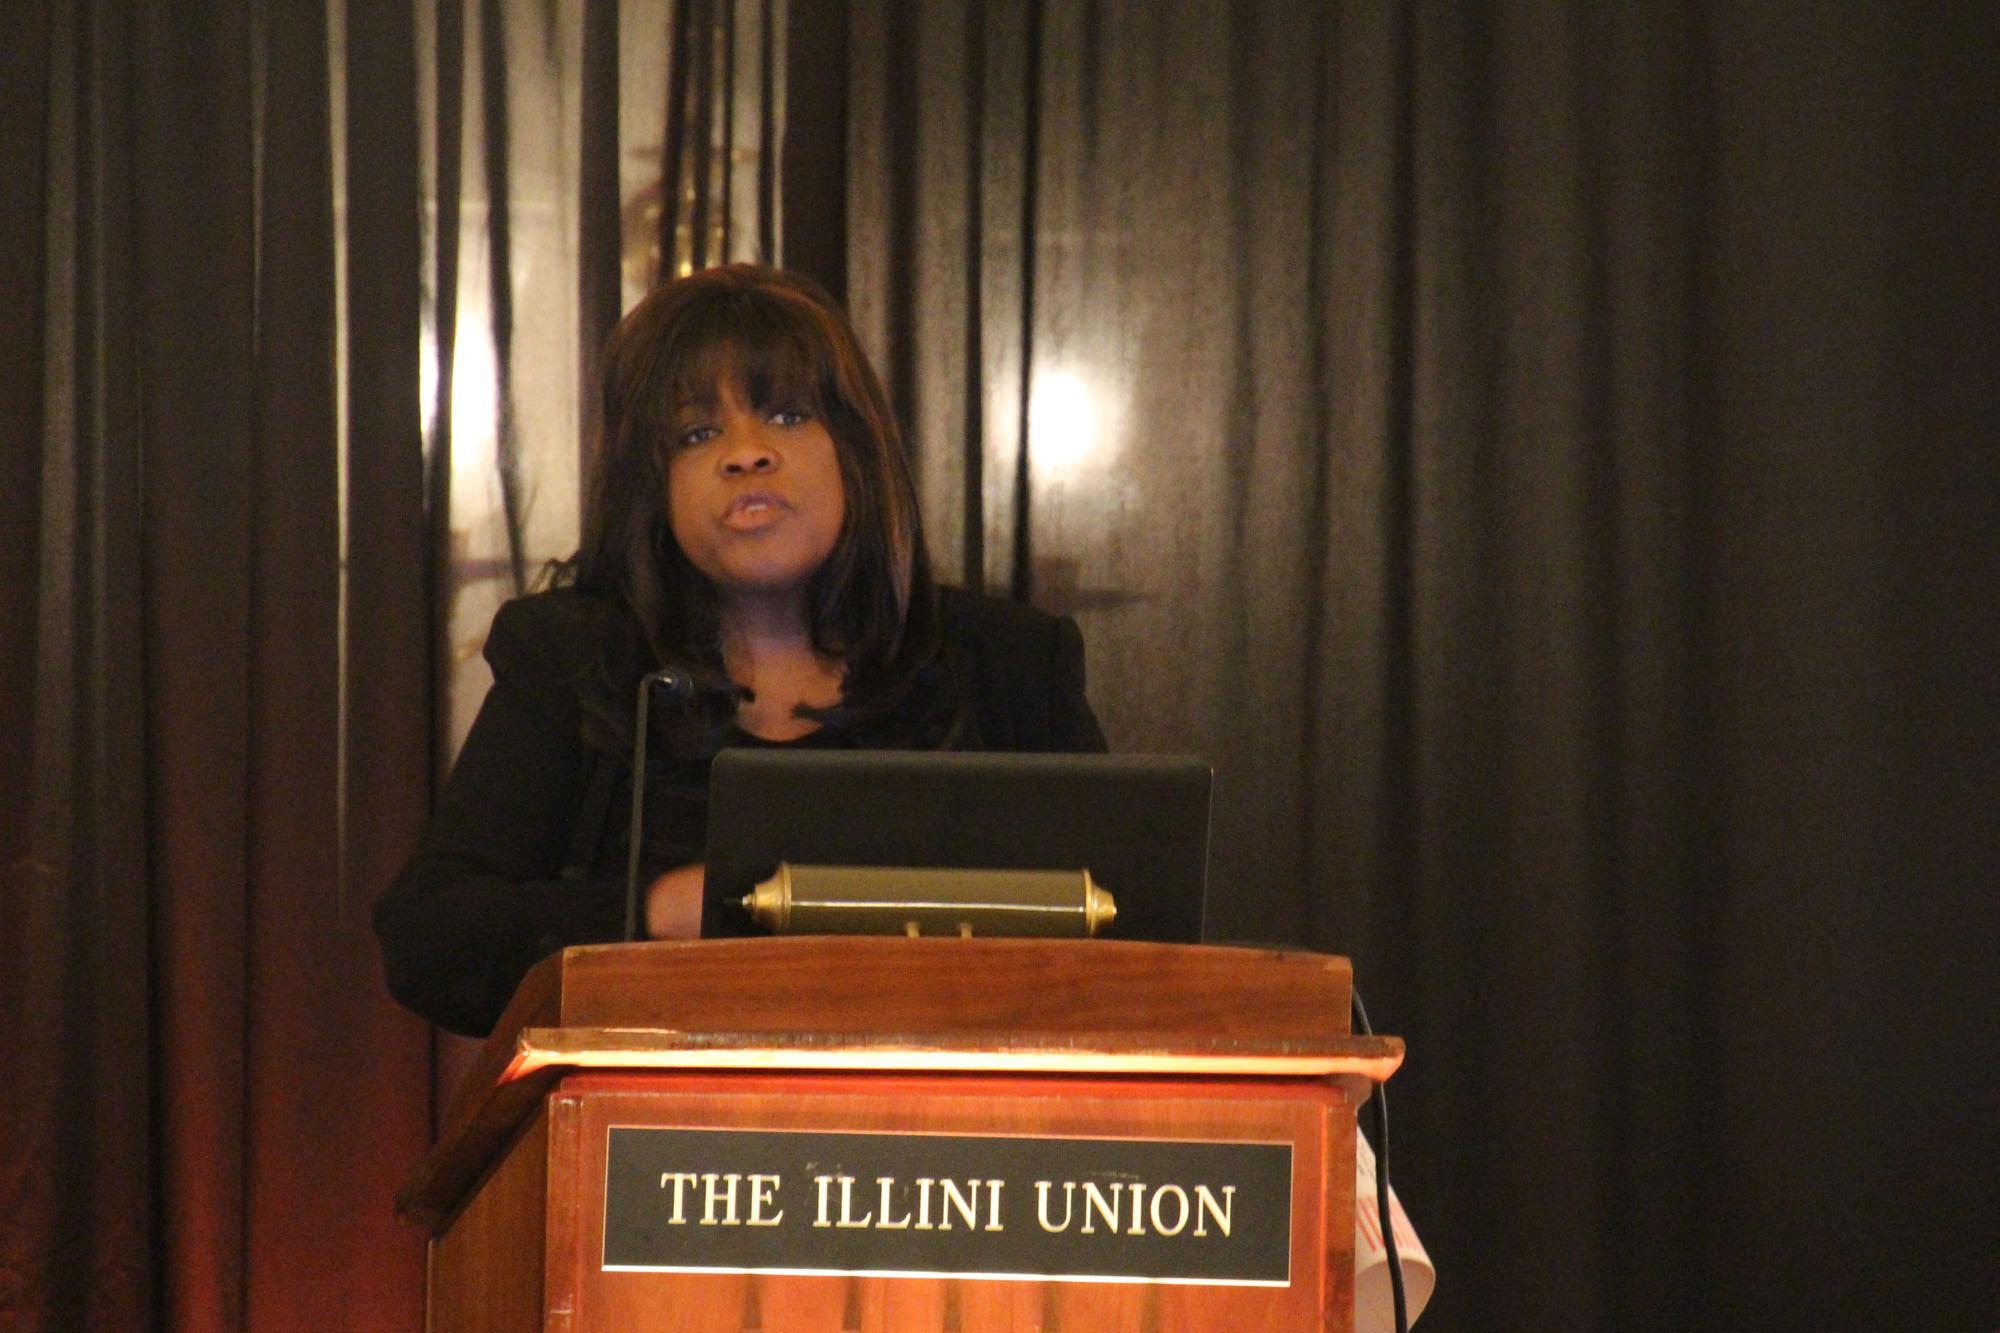 Roger Ebert's wife, Chaz Ebert, speaking at the Illini Union on Nov. 1, 2015.